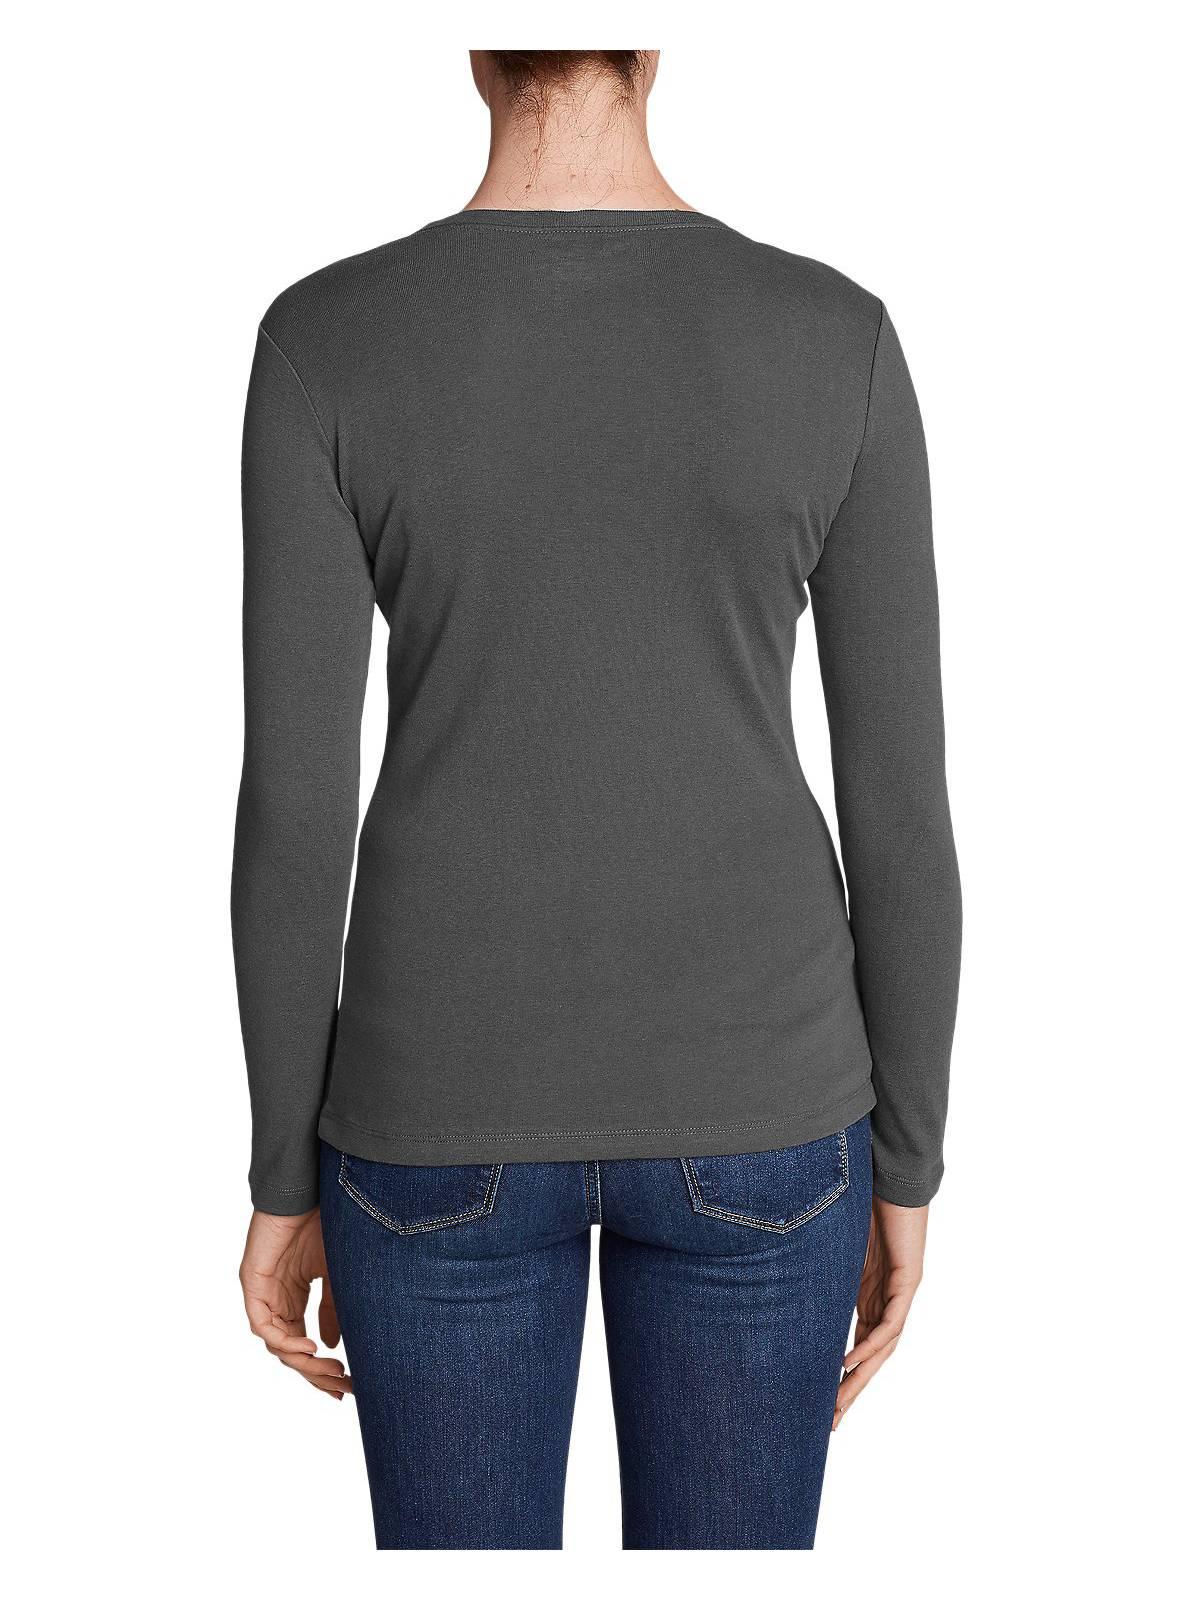 Eddie-Bauer-Women-039-s-Favorite-Long-Sleeve-Crewneck-T-Shirt thumbnail 45